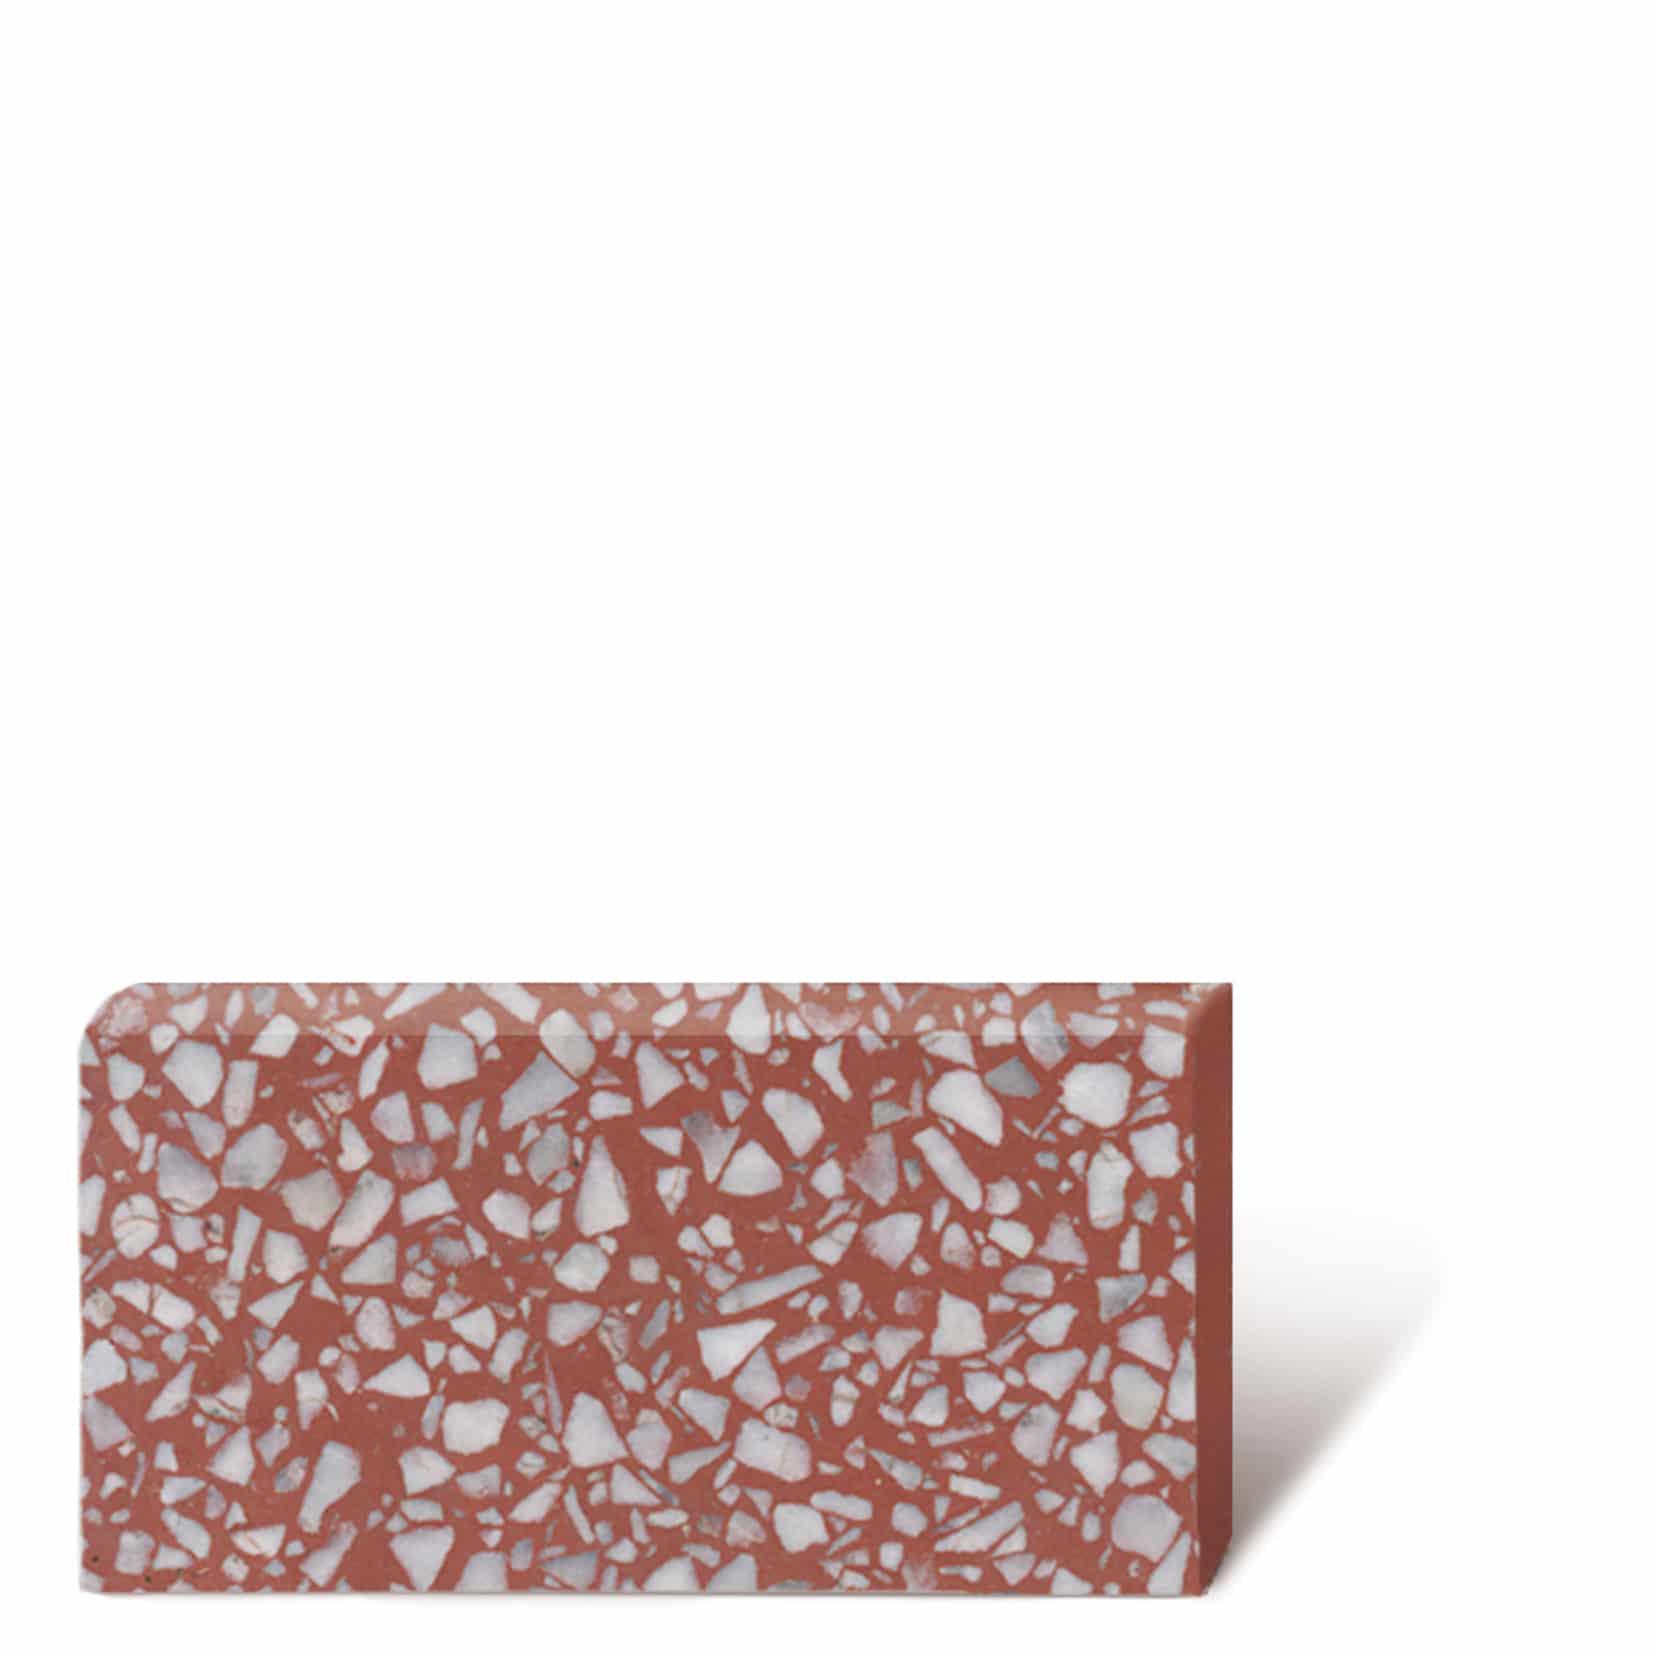 N° 900032w - Sockel Terrazzo GROB